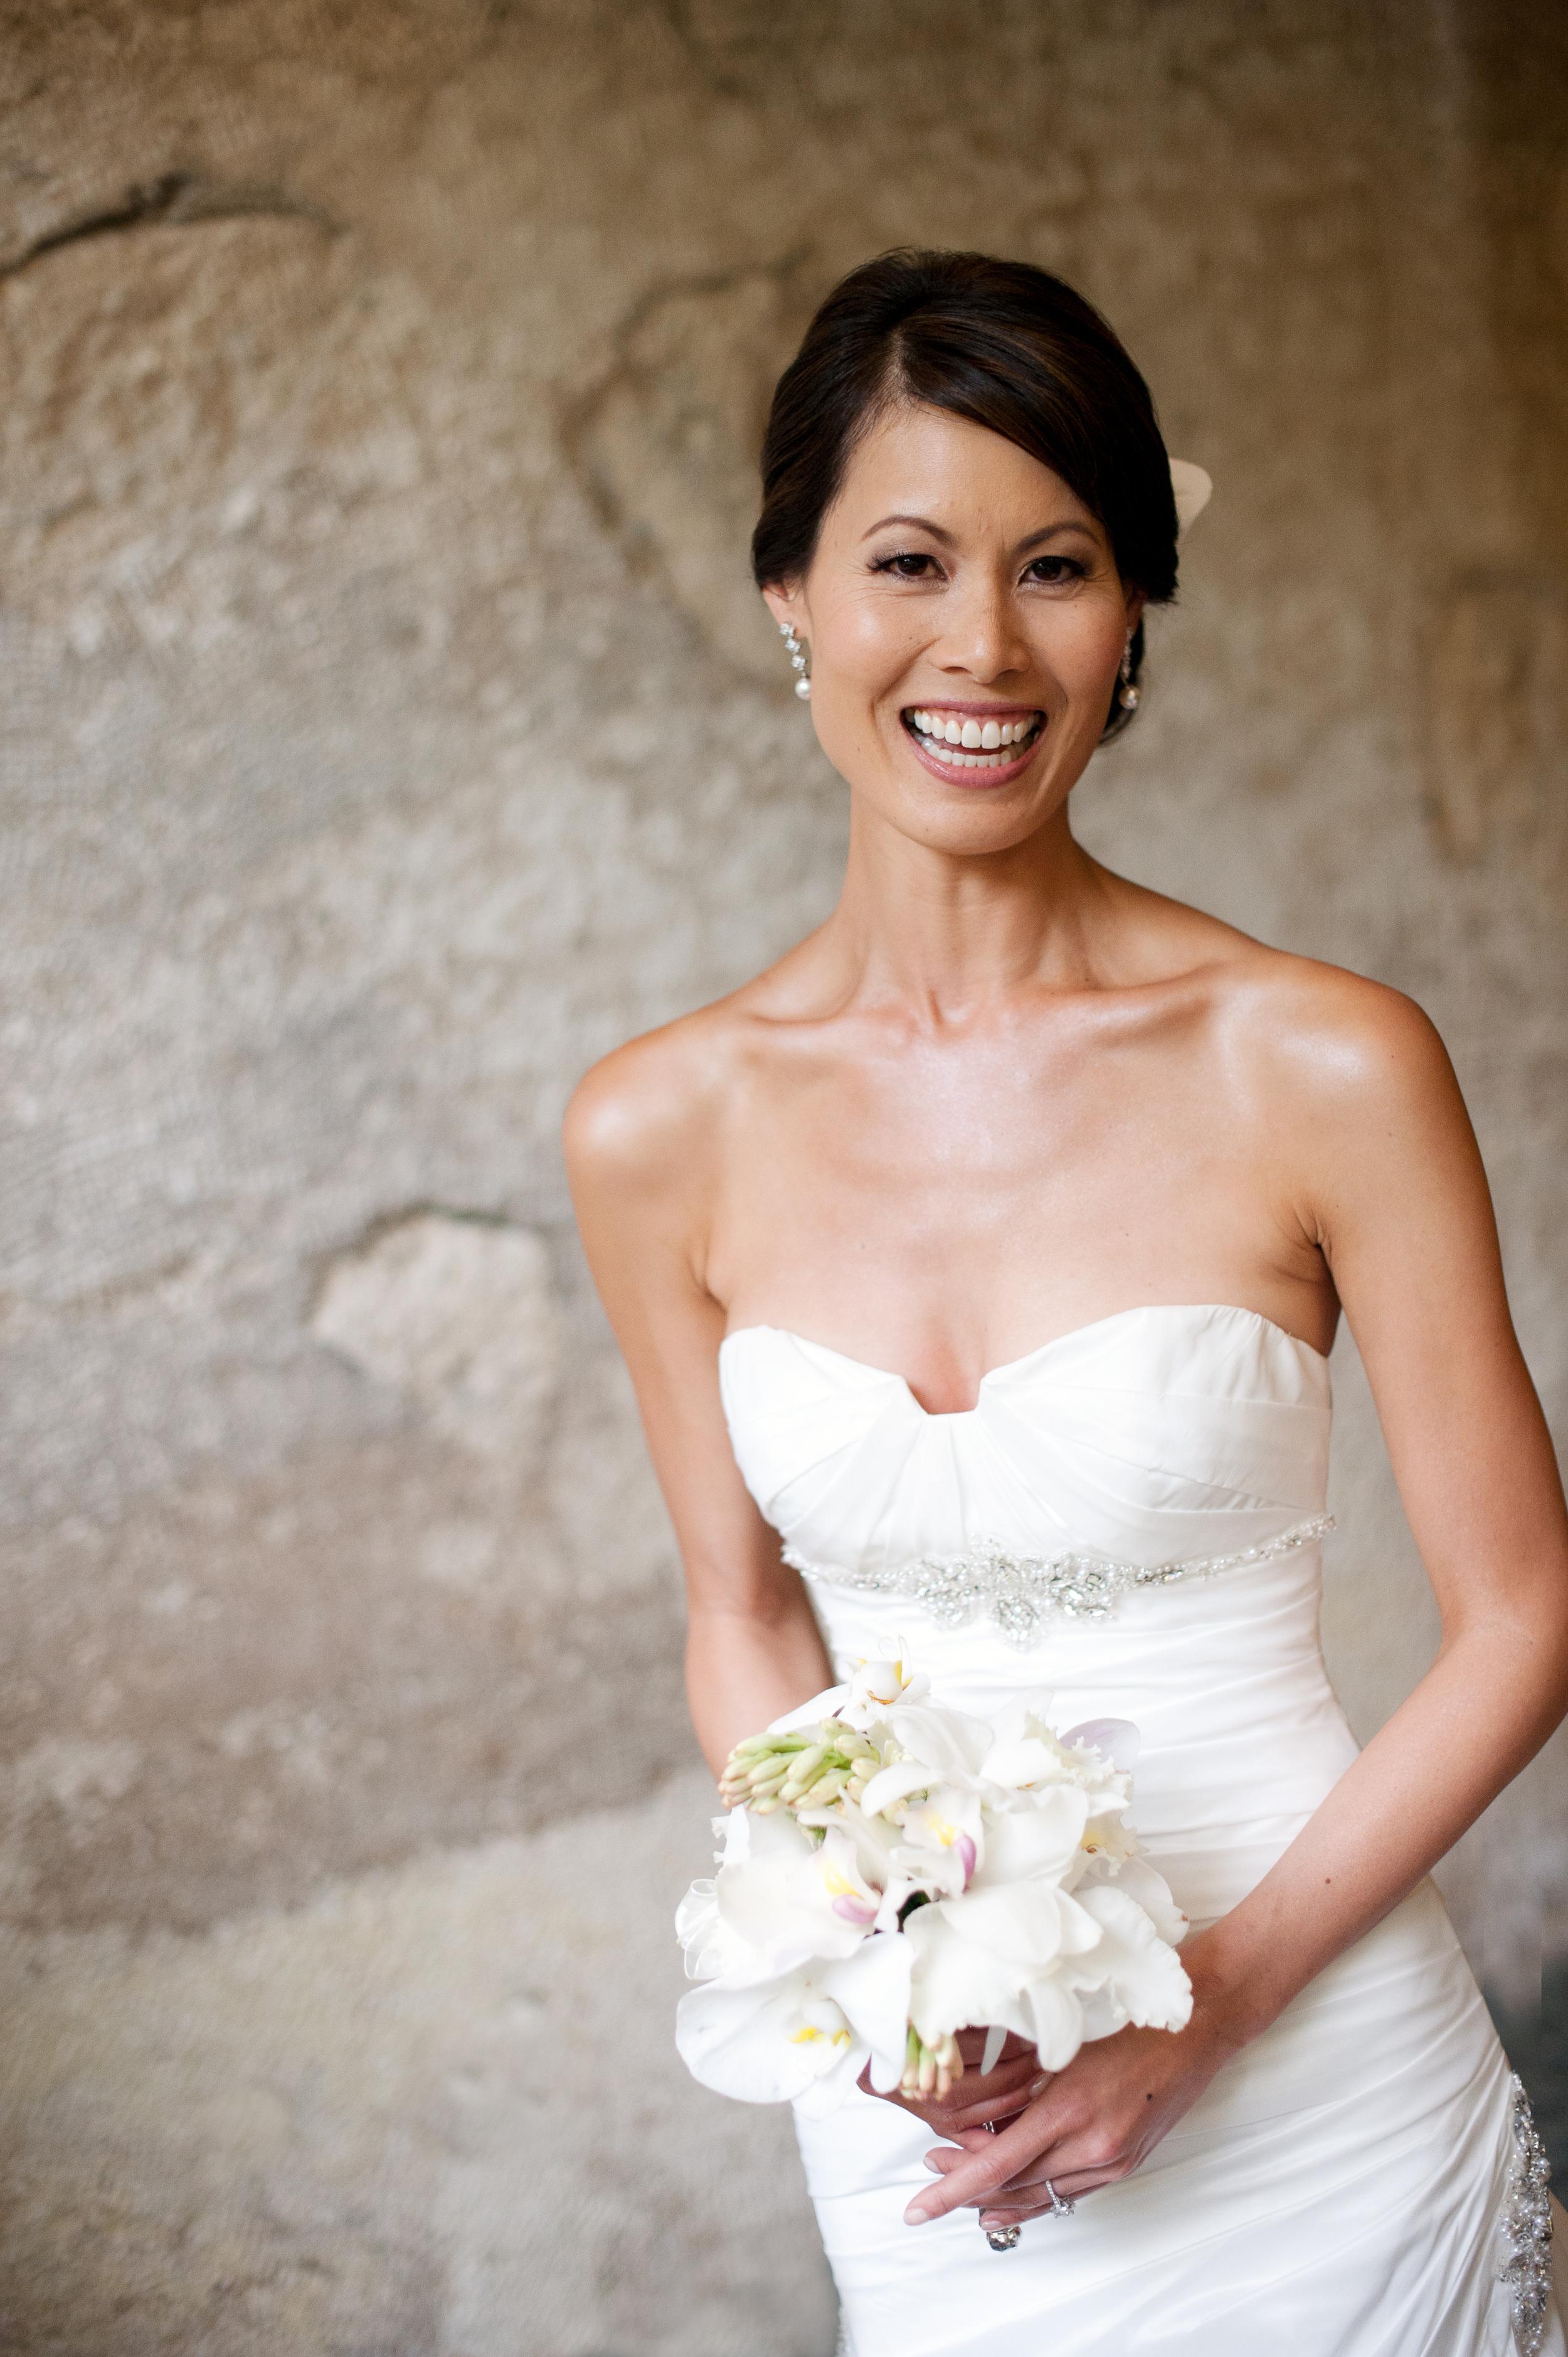 seattle-wedding-photographer-6-2.jpg